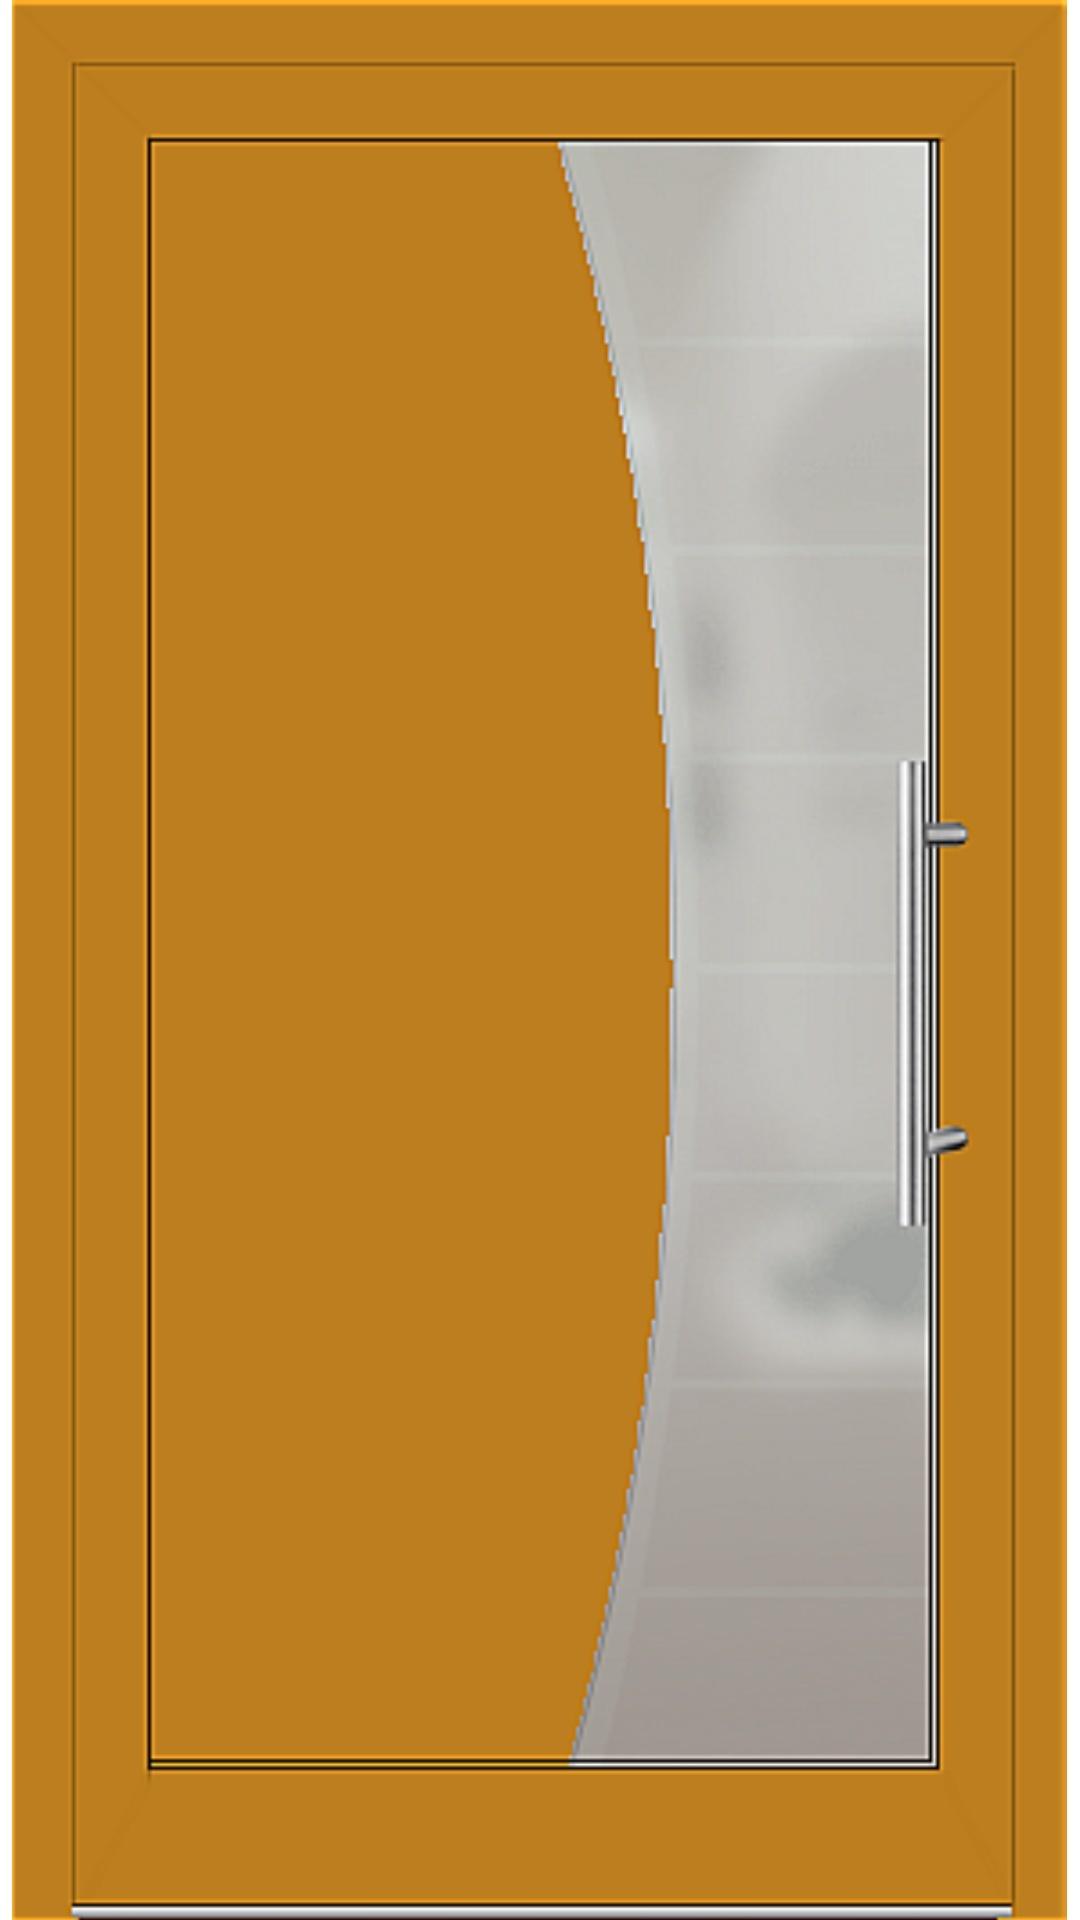 Kunststoff Haustür Modell 6516-50 honiggelb